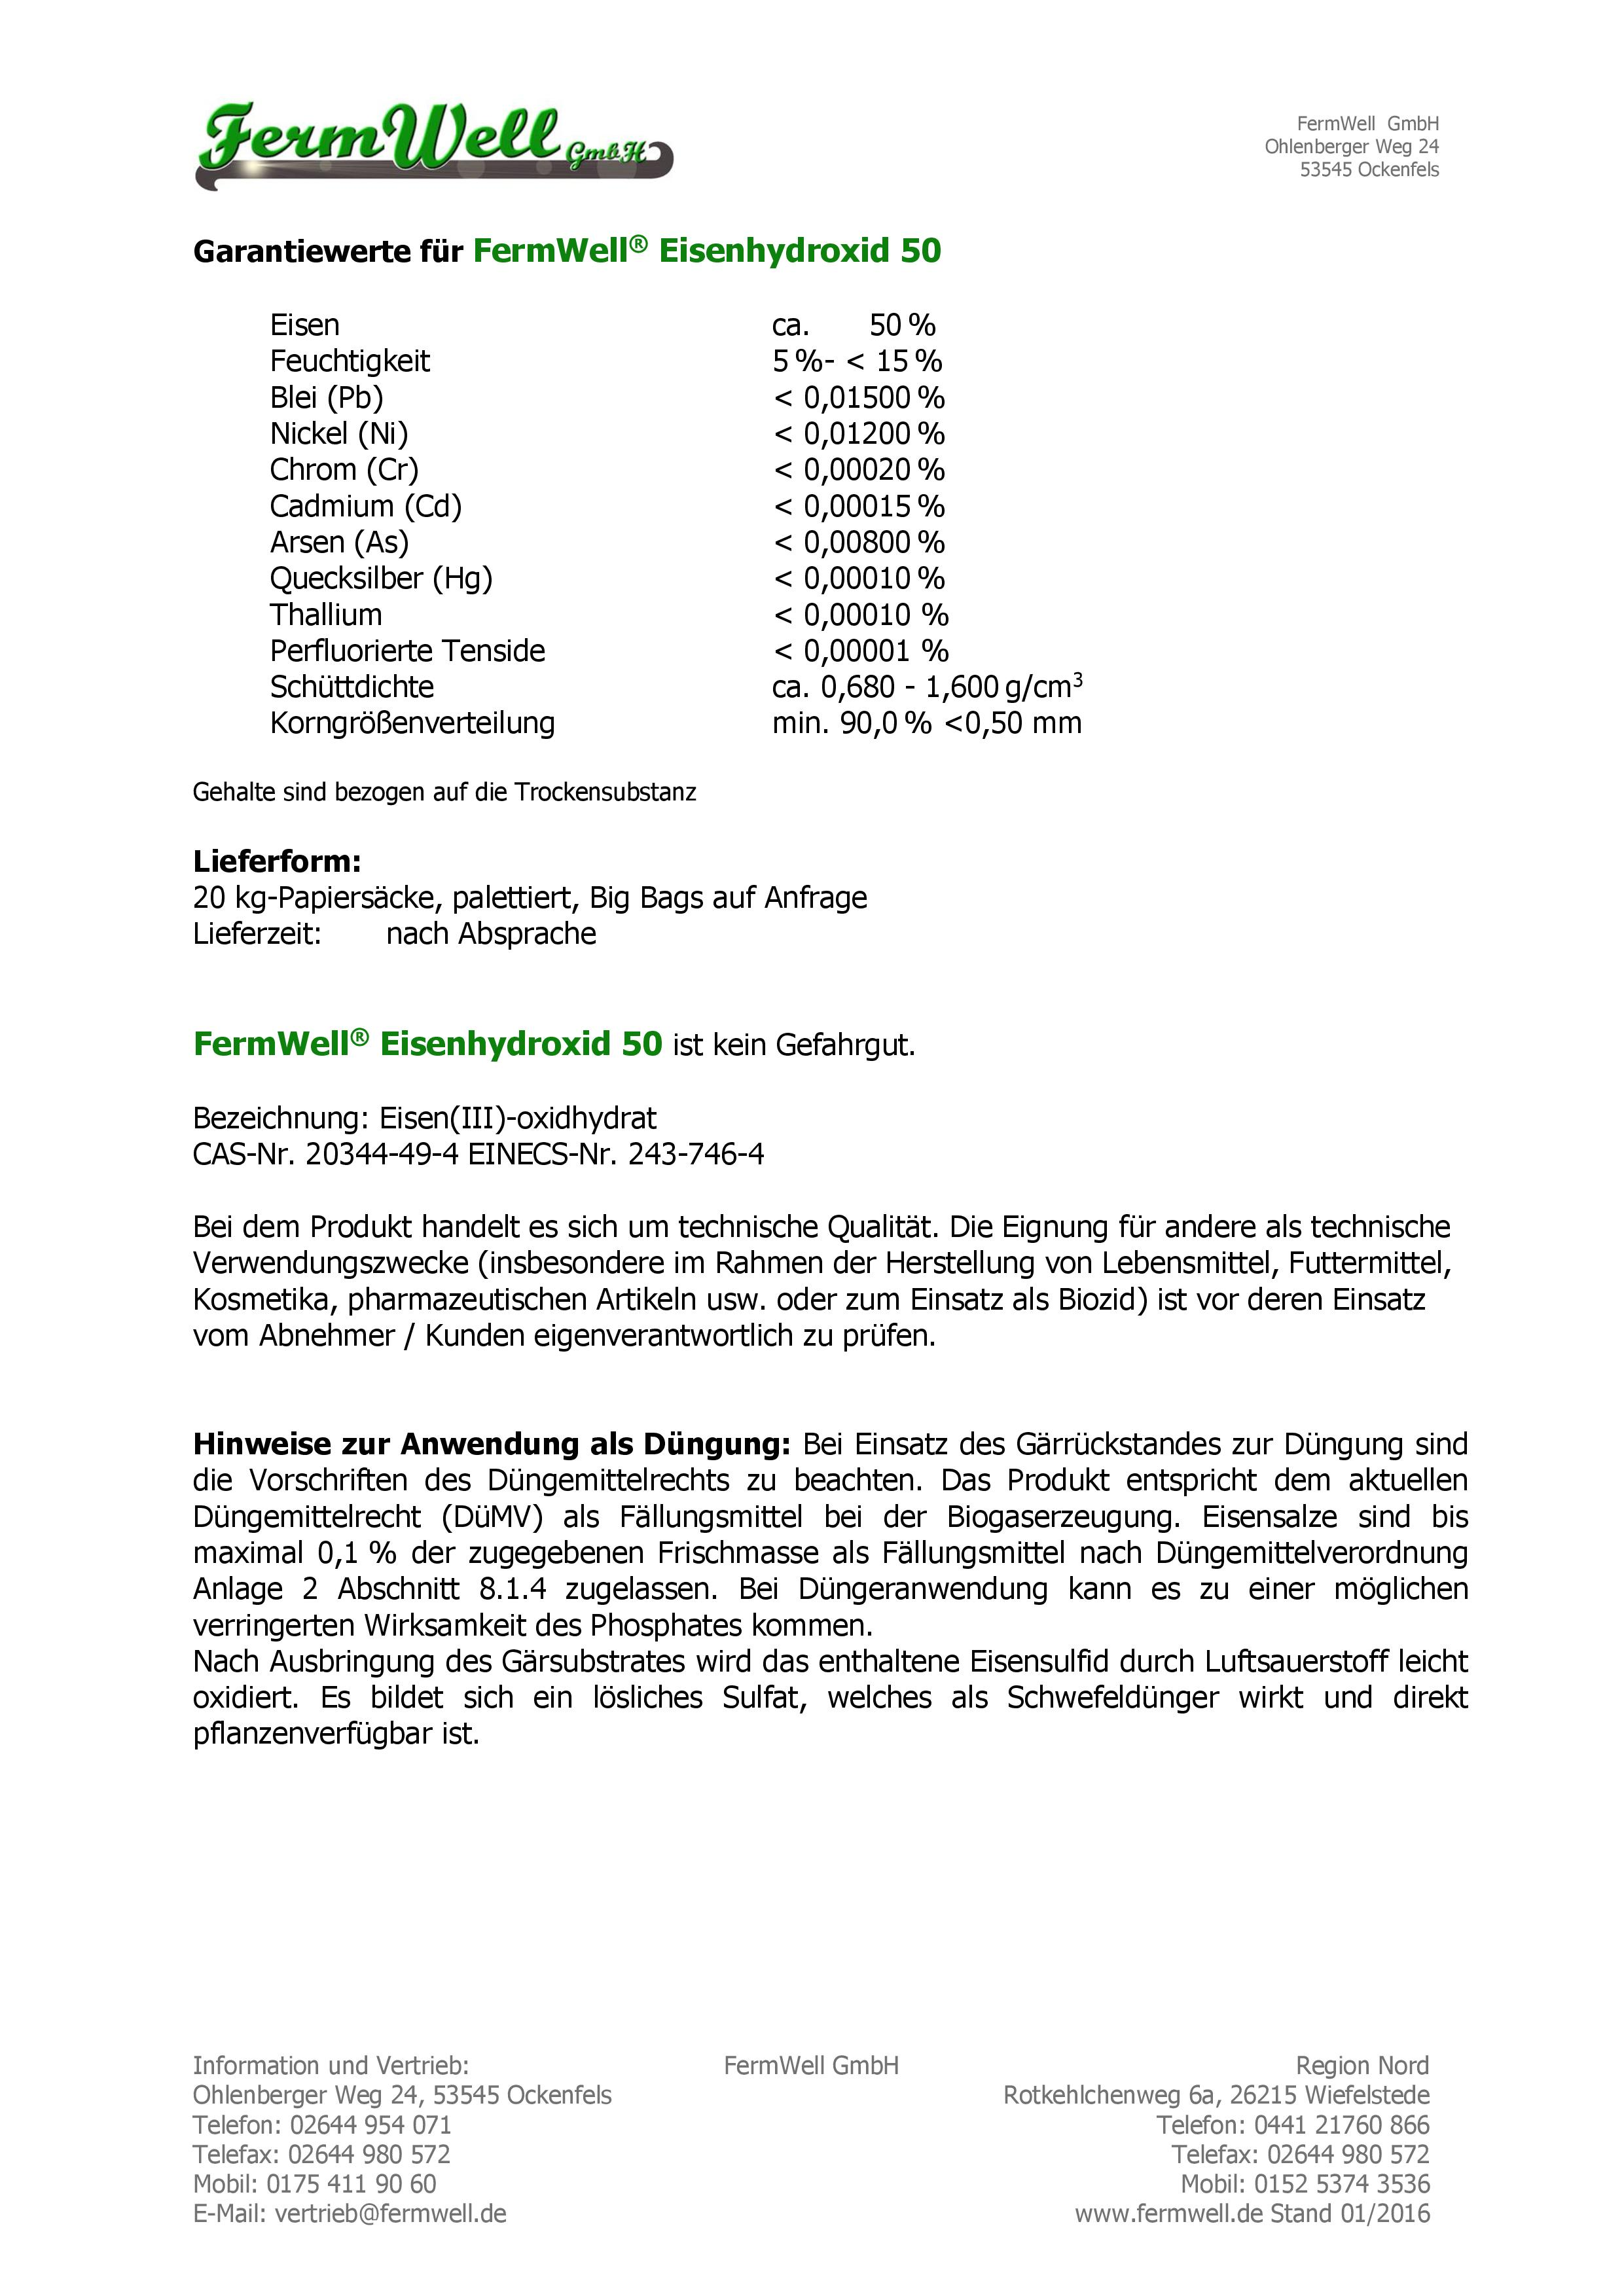 FWG_Eisenhydroxid_50_Produktbeschreib_16